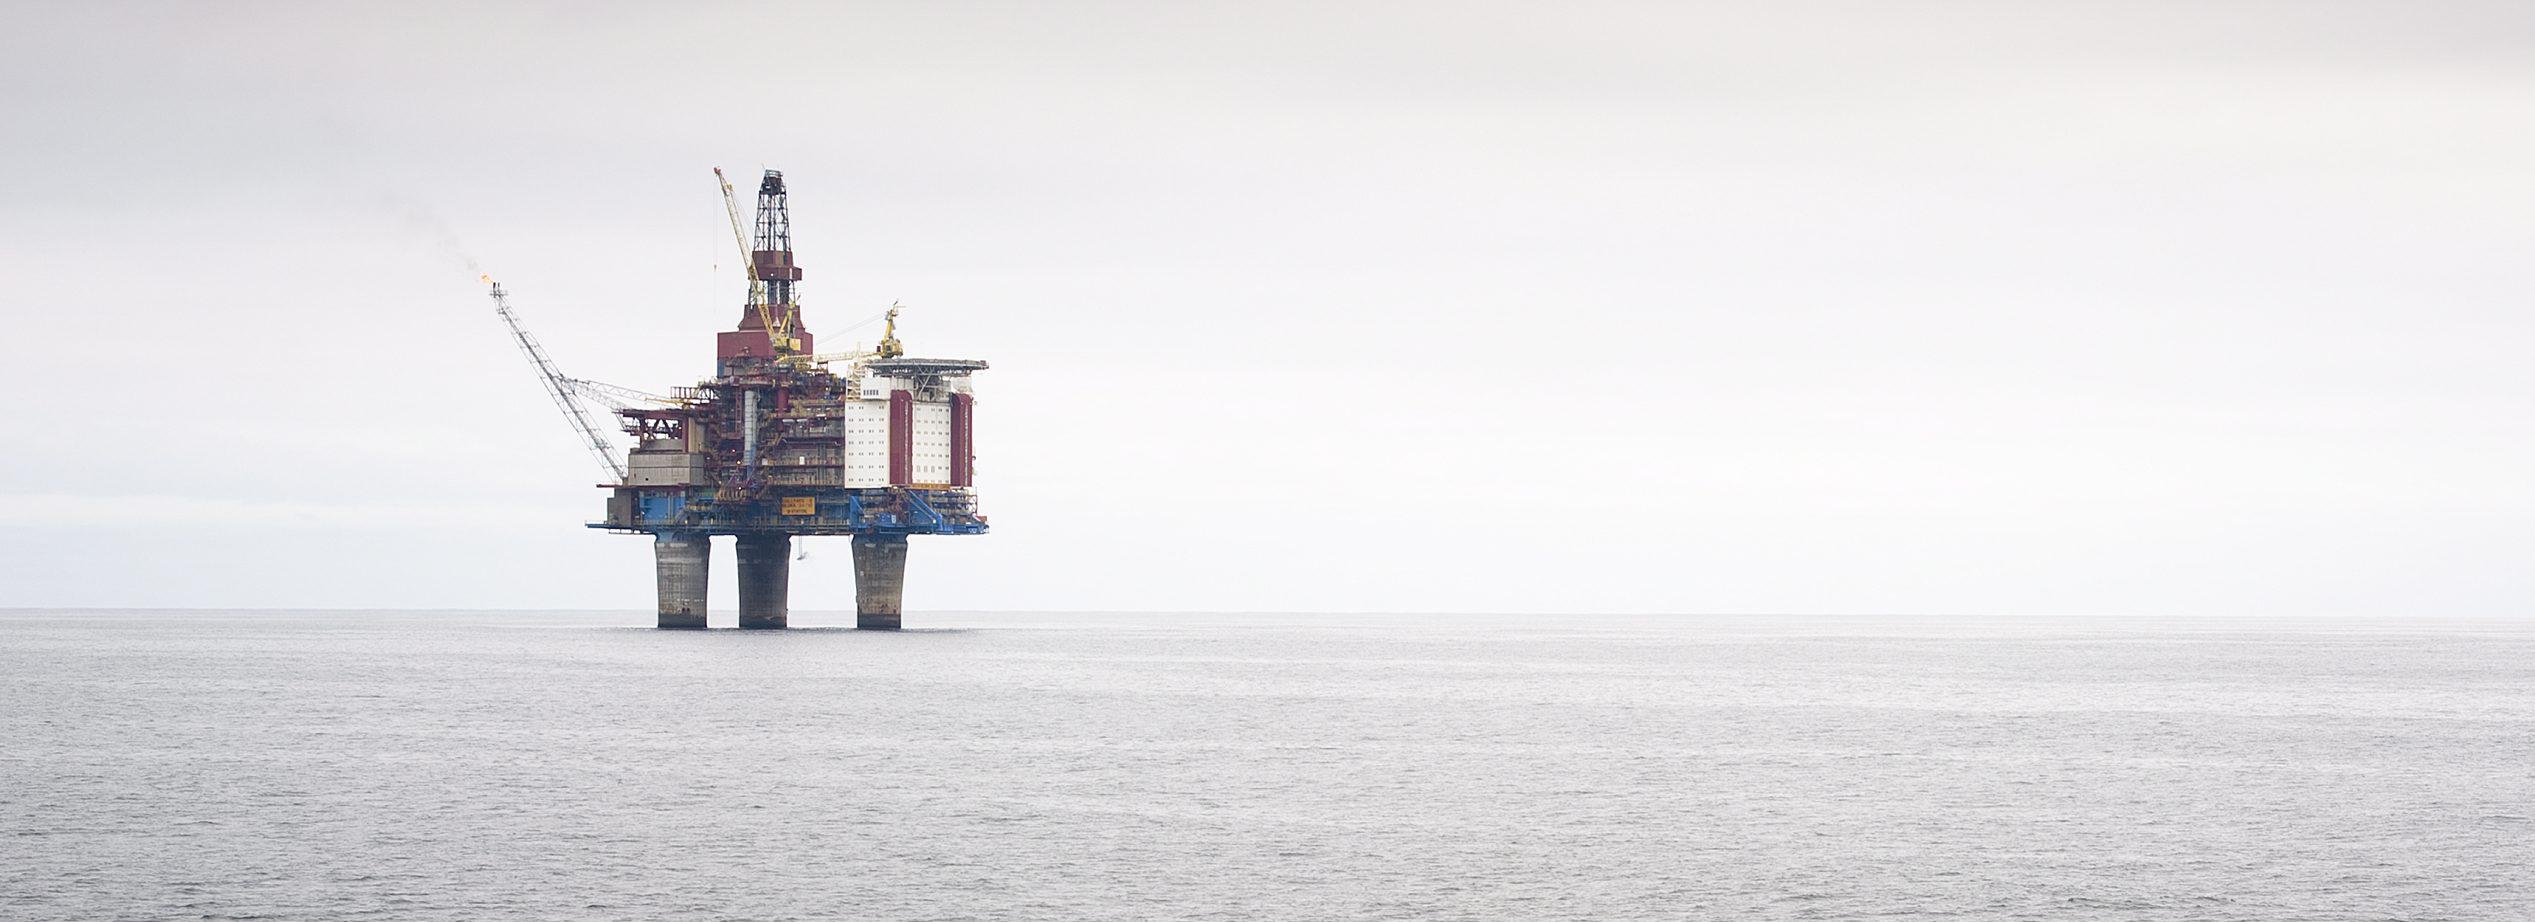 Norwegian oil